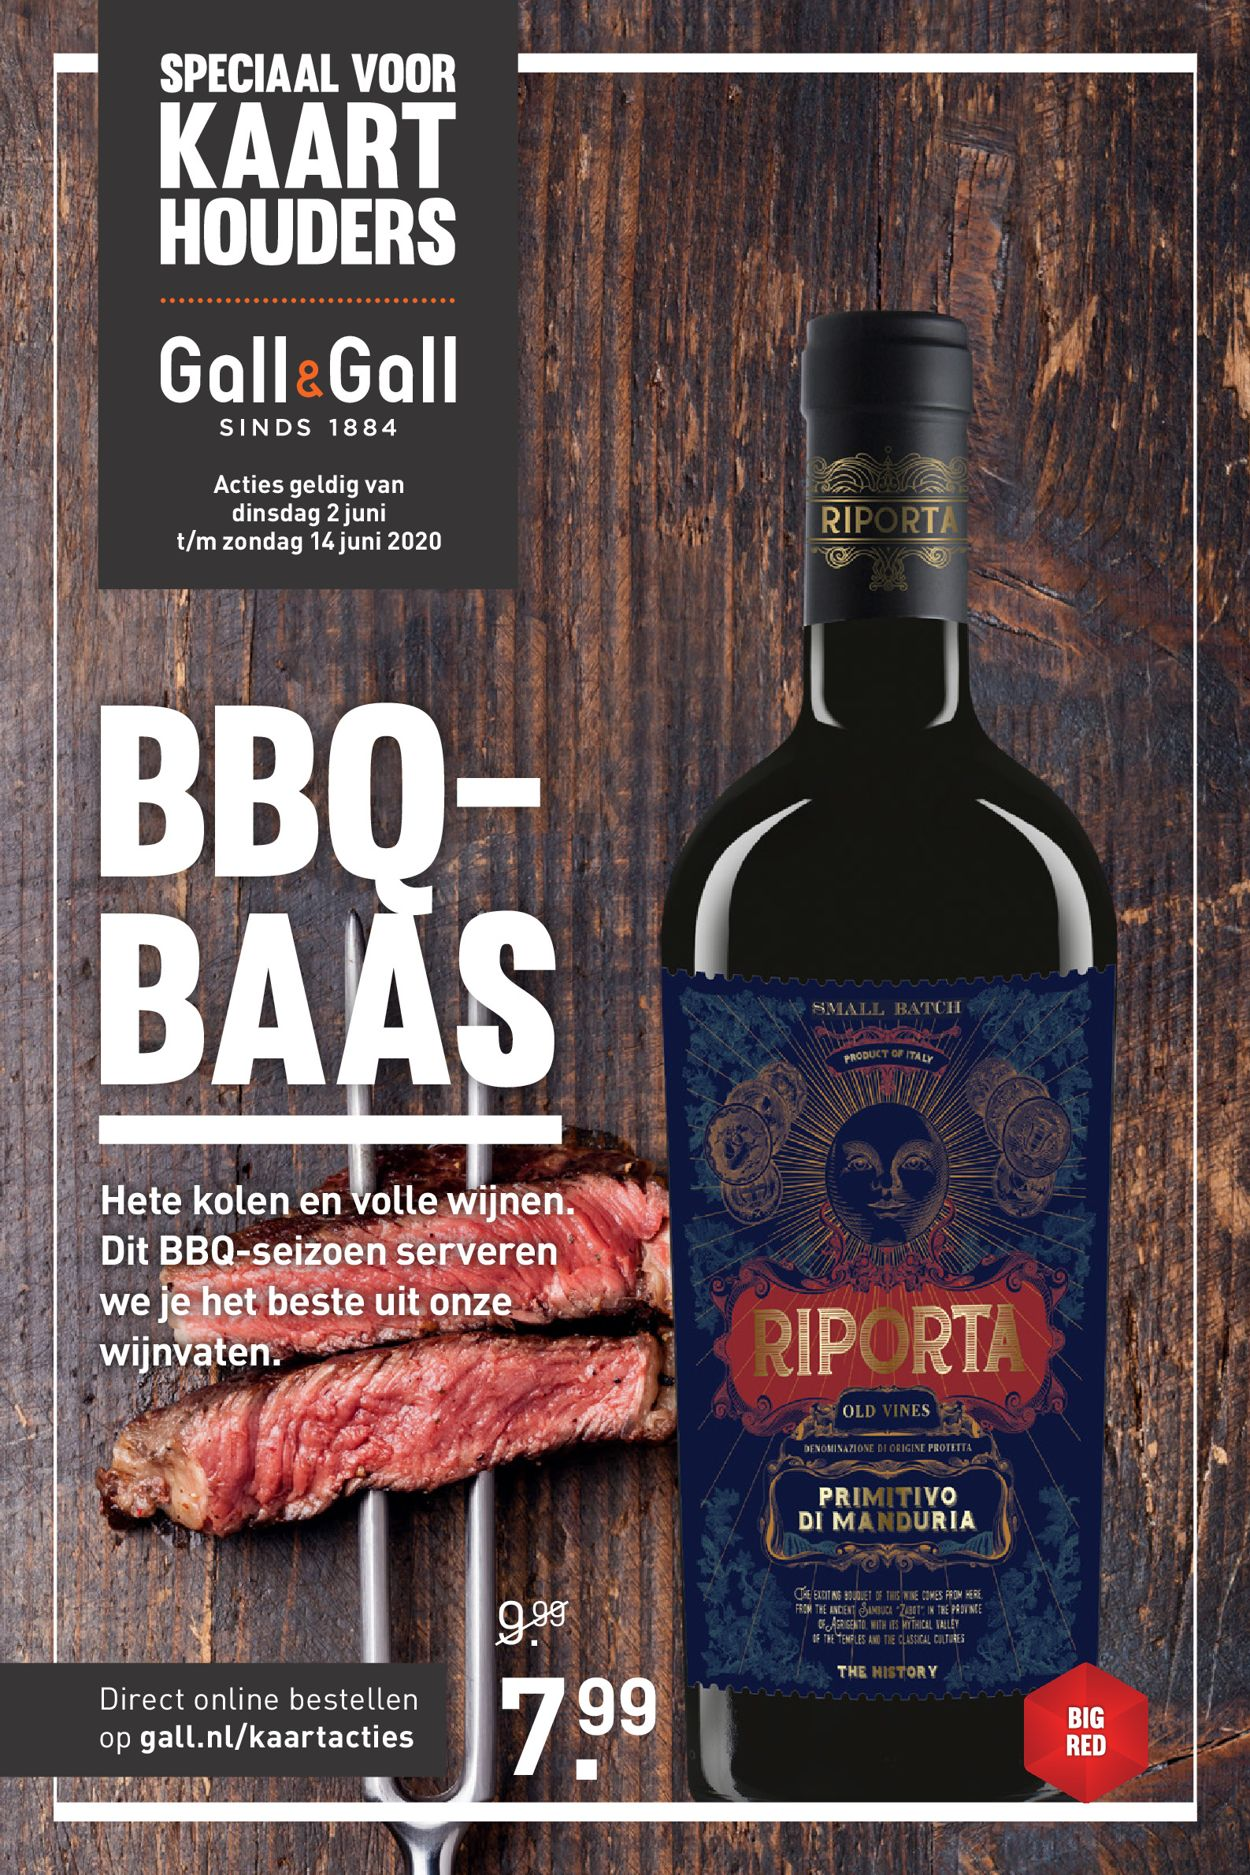 Gall & Gall Folder - 02.06-14.06.2020